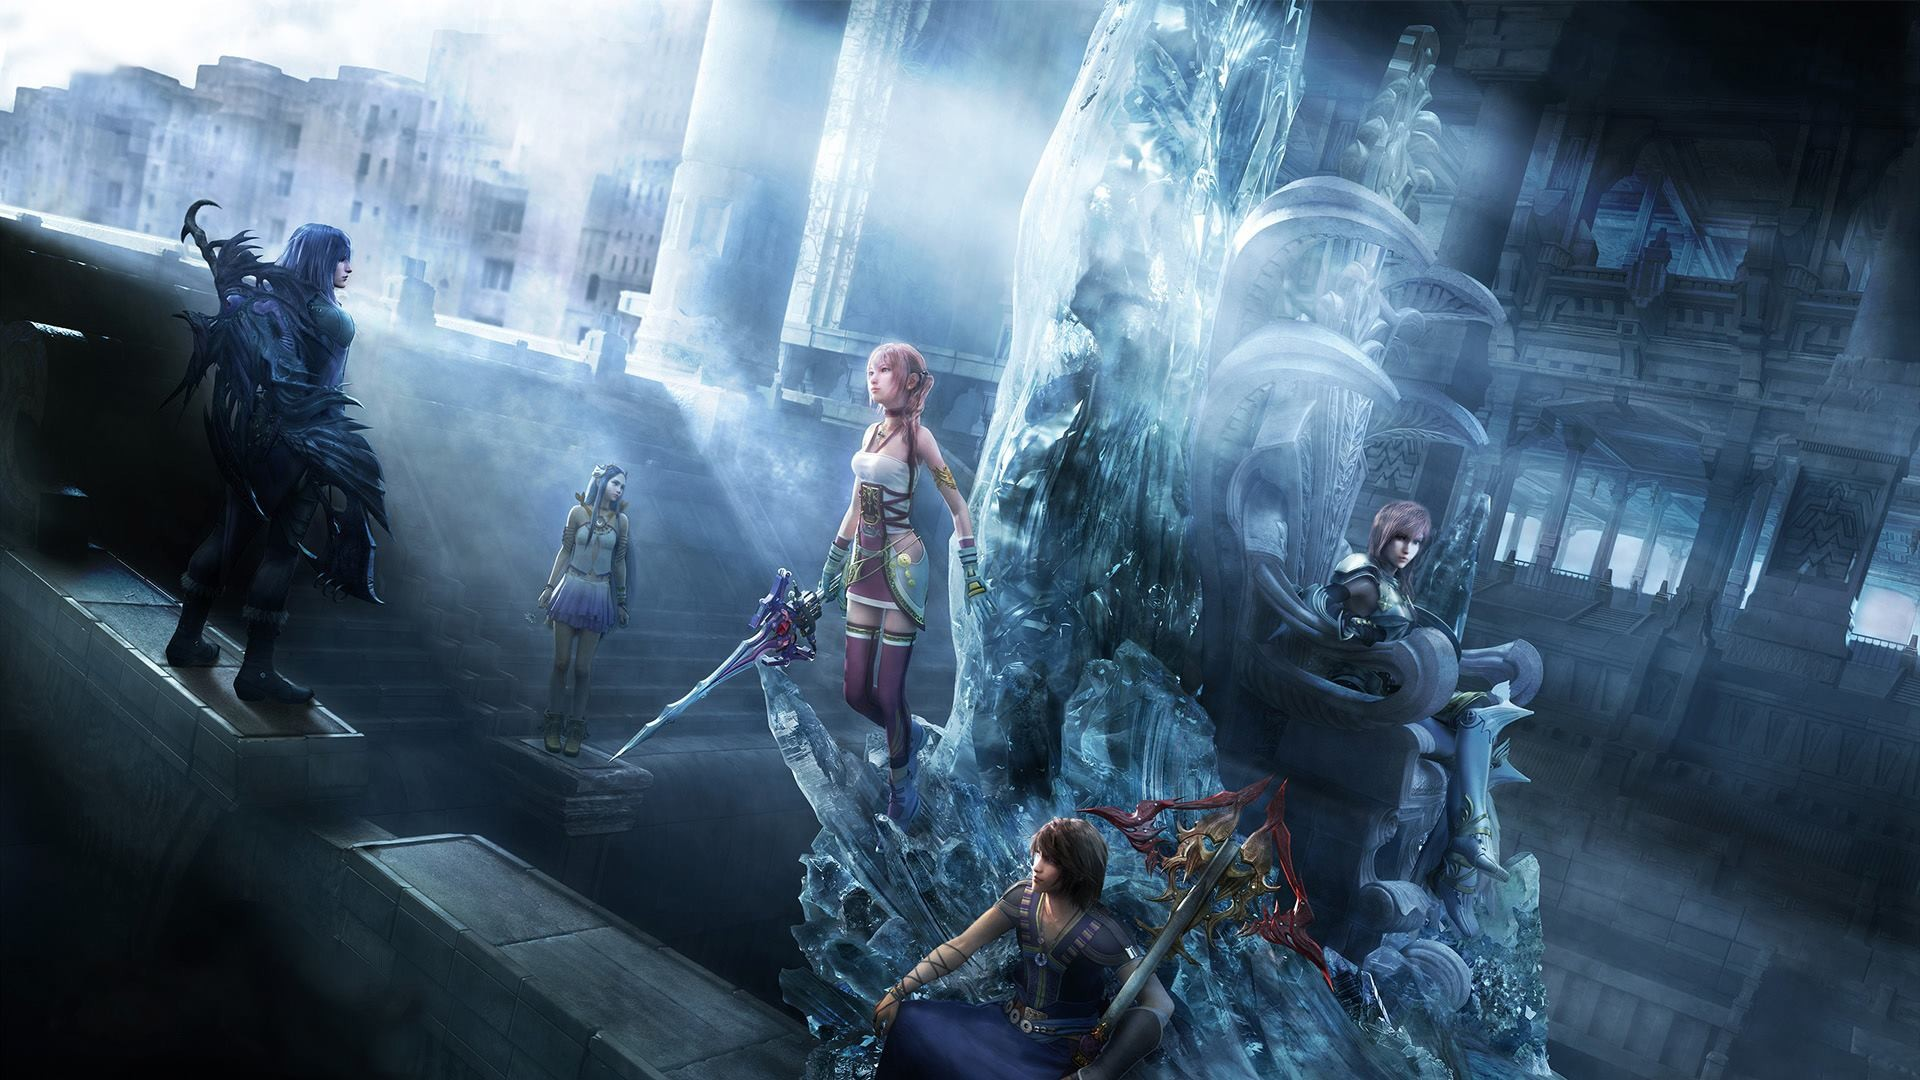 Final Fantasy XIII · download Final Fantasy XIII image